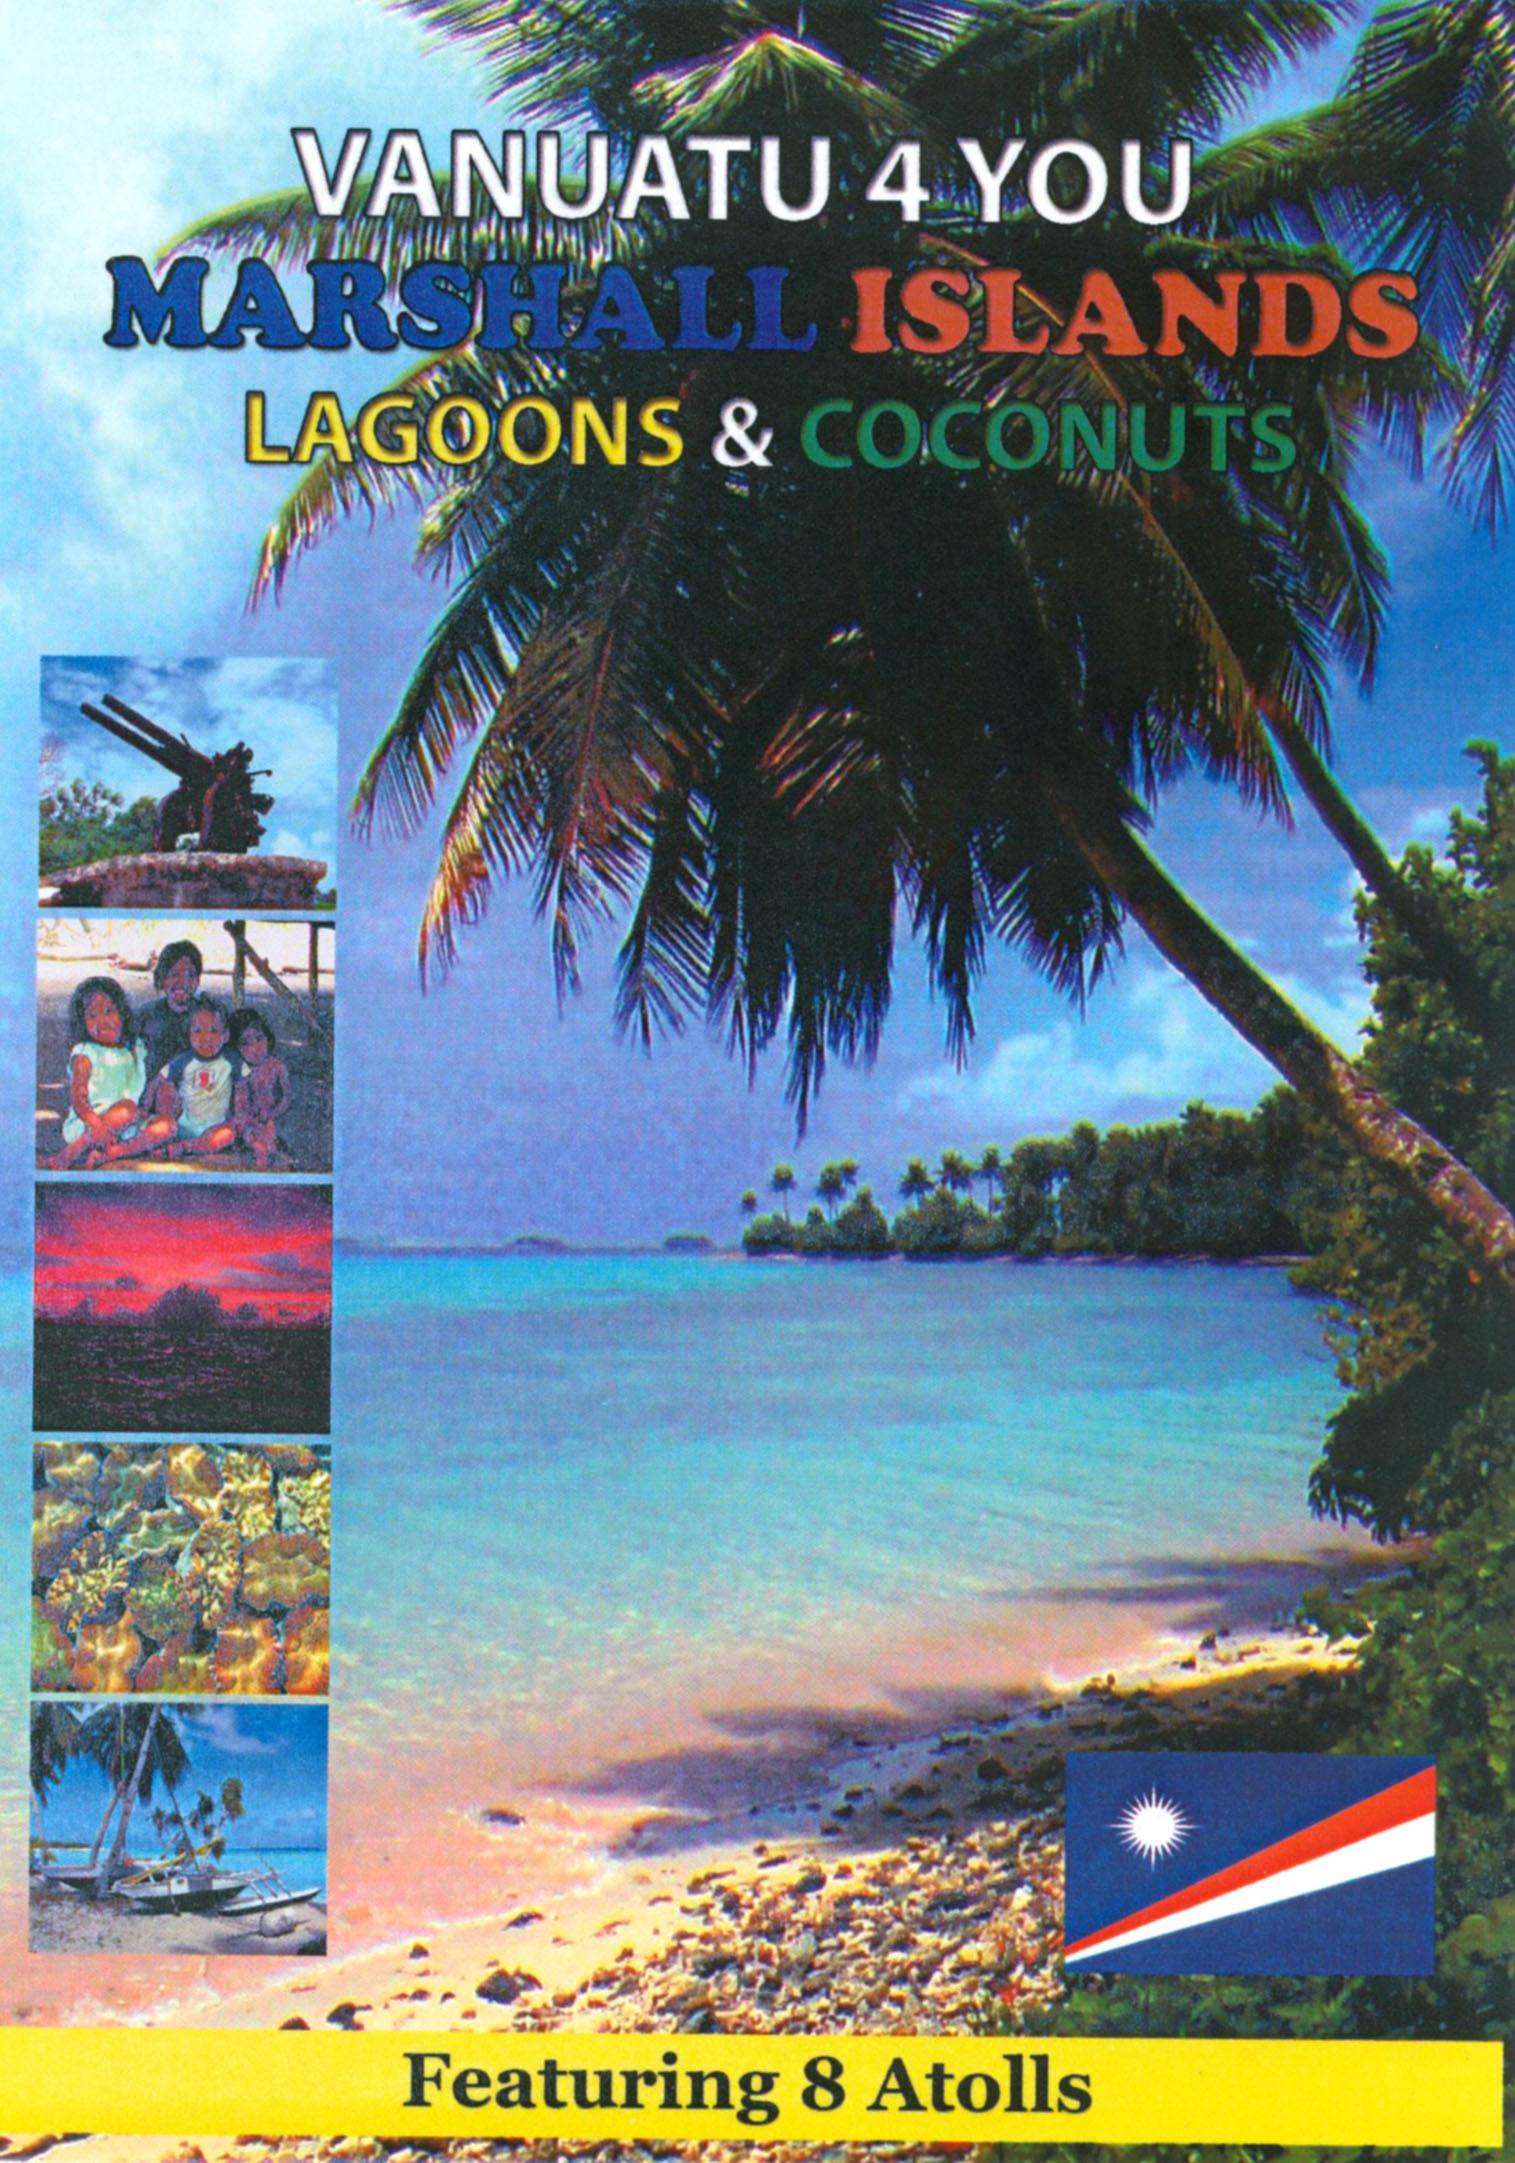 Vanuatu 4 You: Marshall Islands - Lagoons & Coconuts